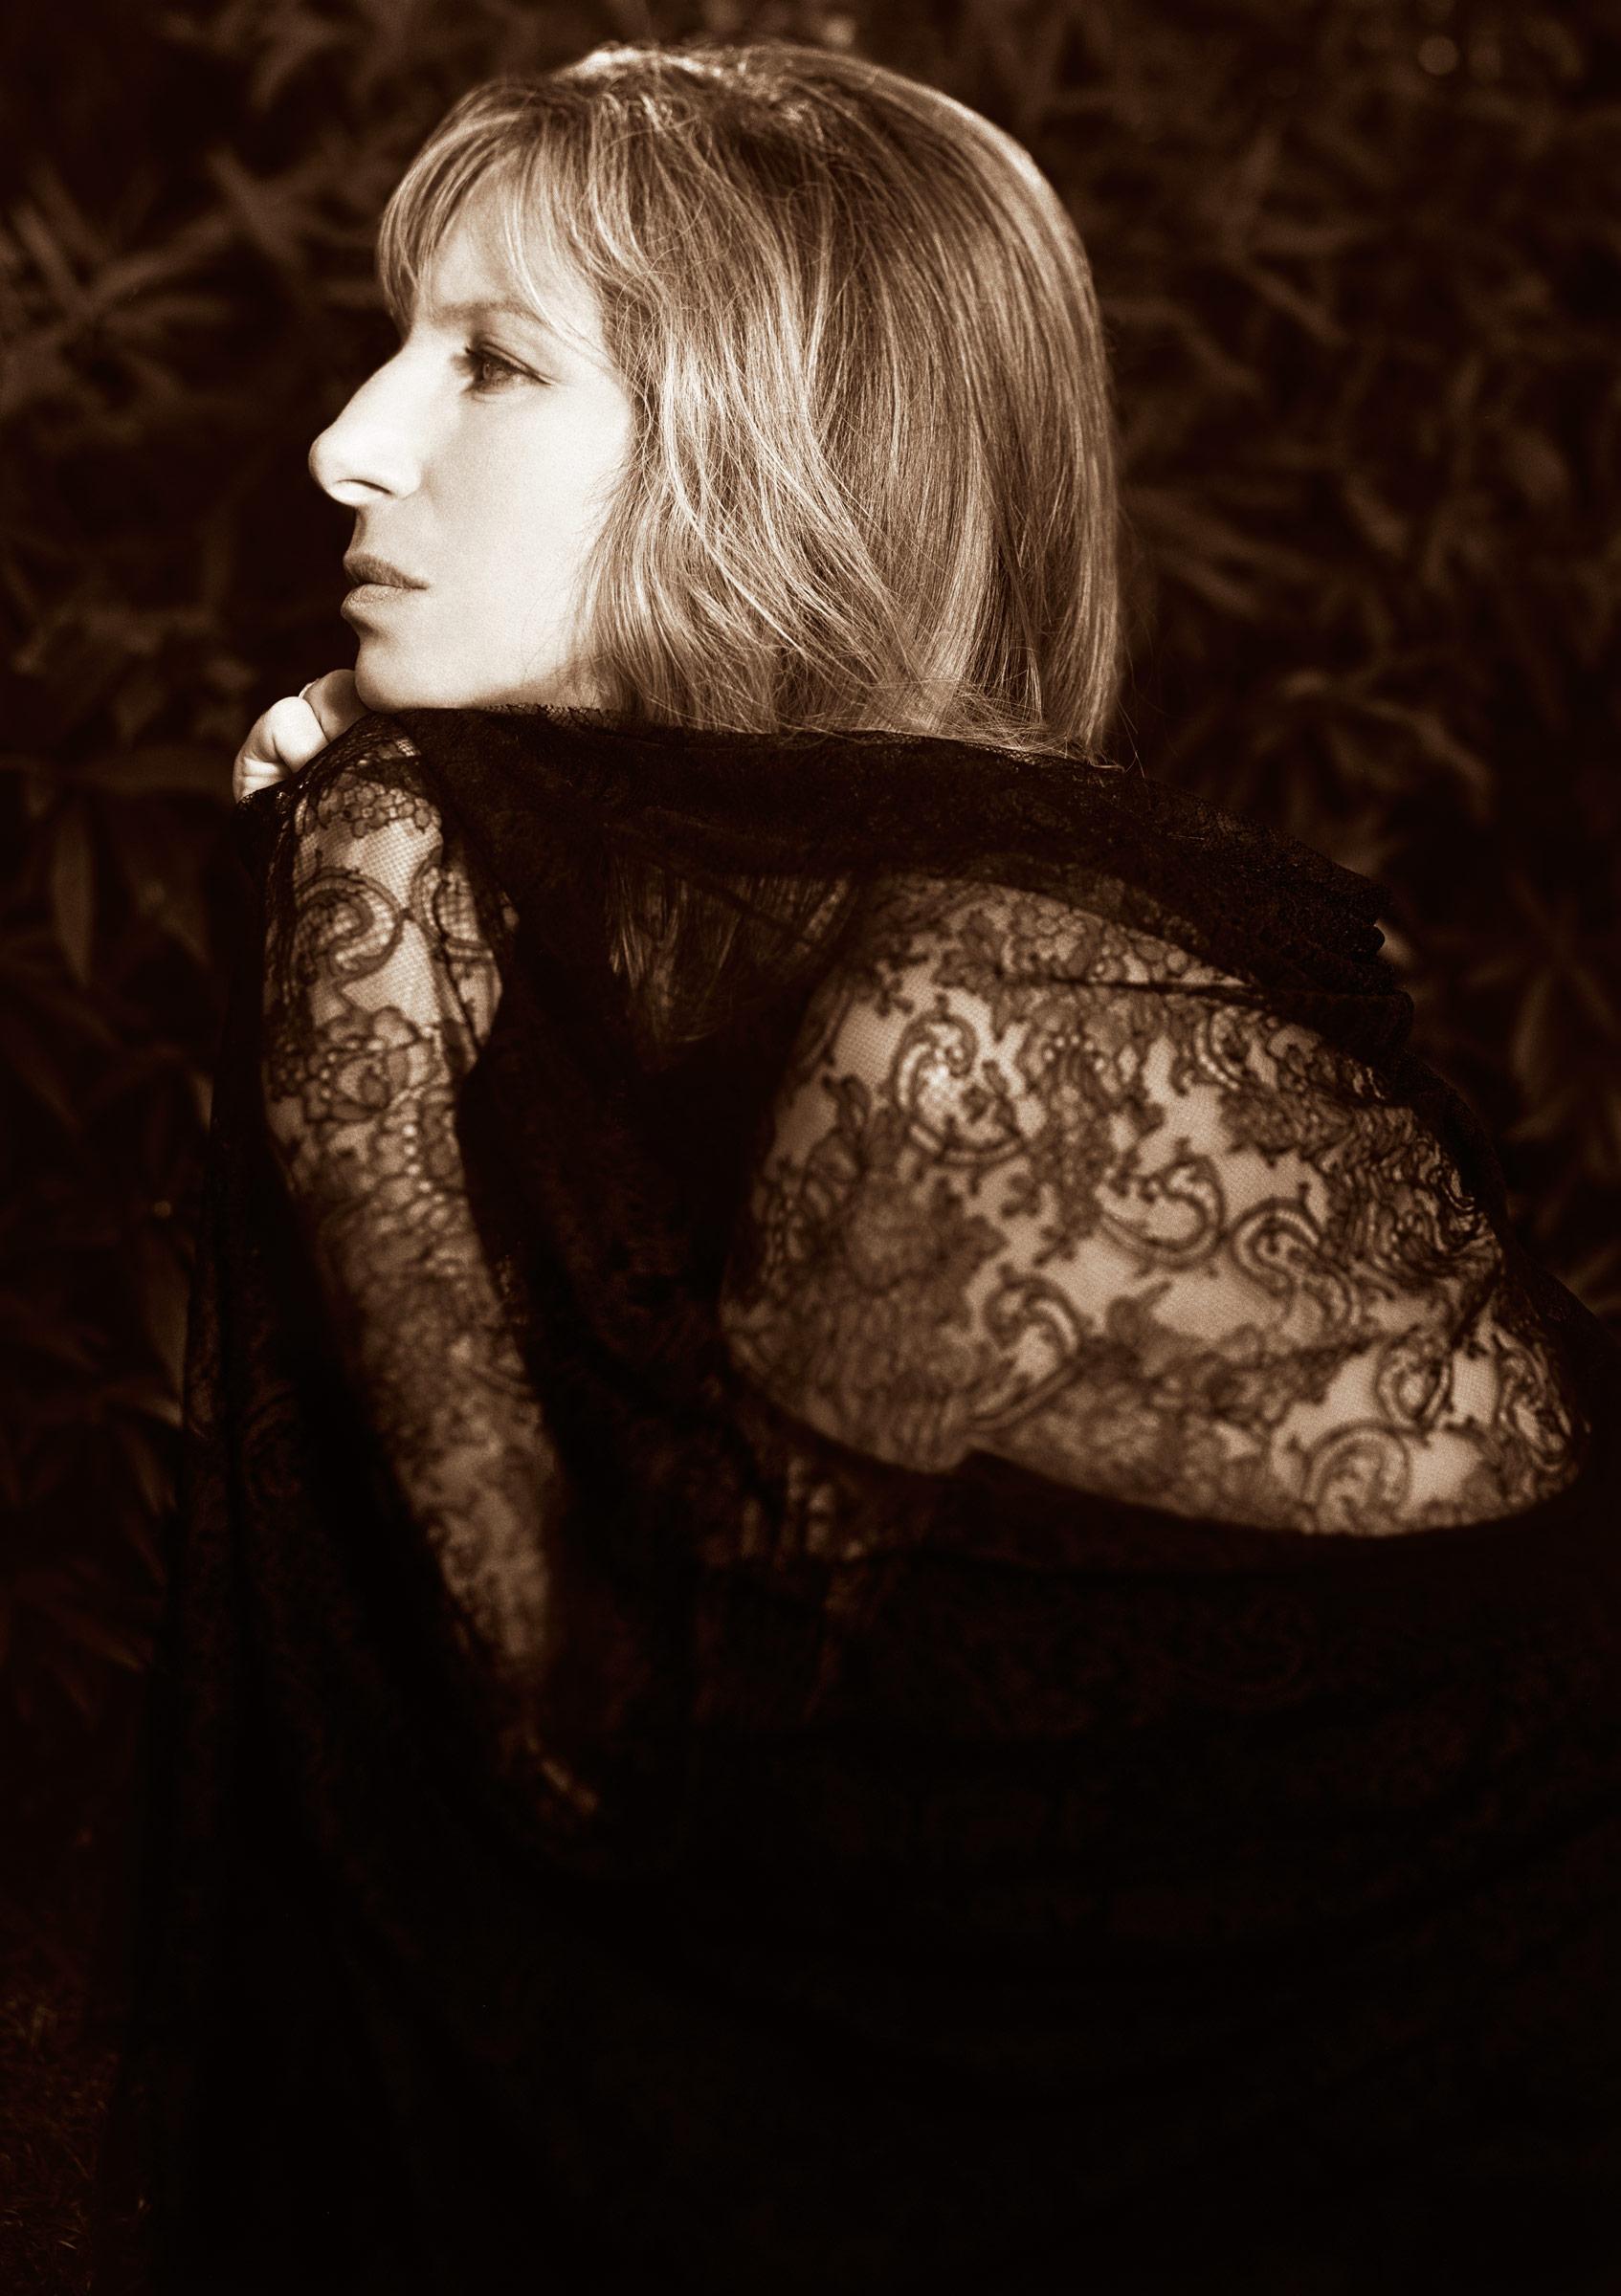 Barbara-Streisand-1360_044_004_p3.jpg